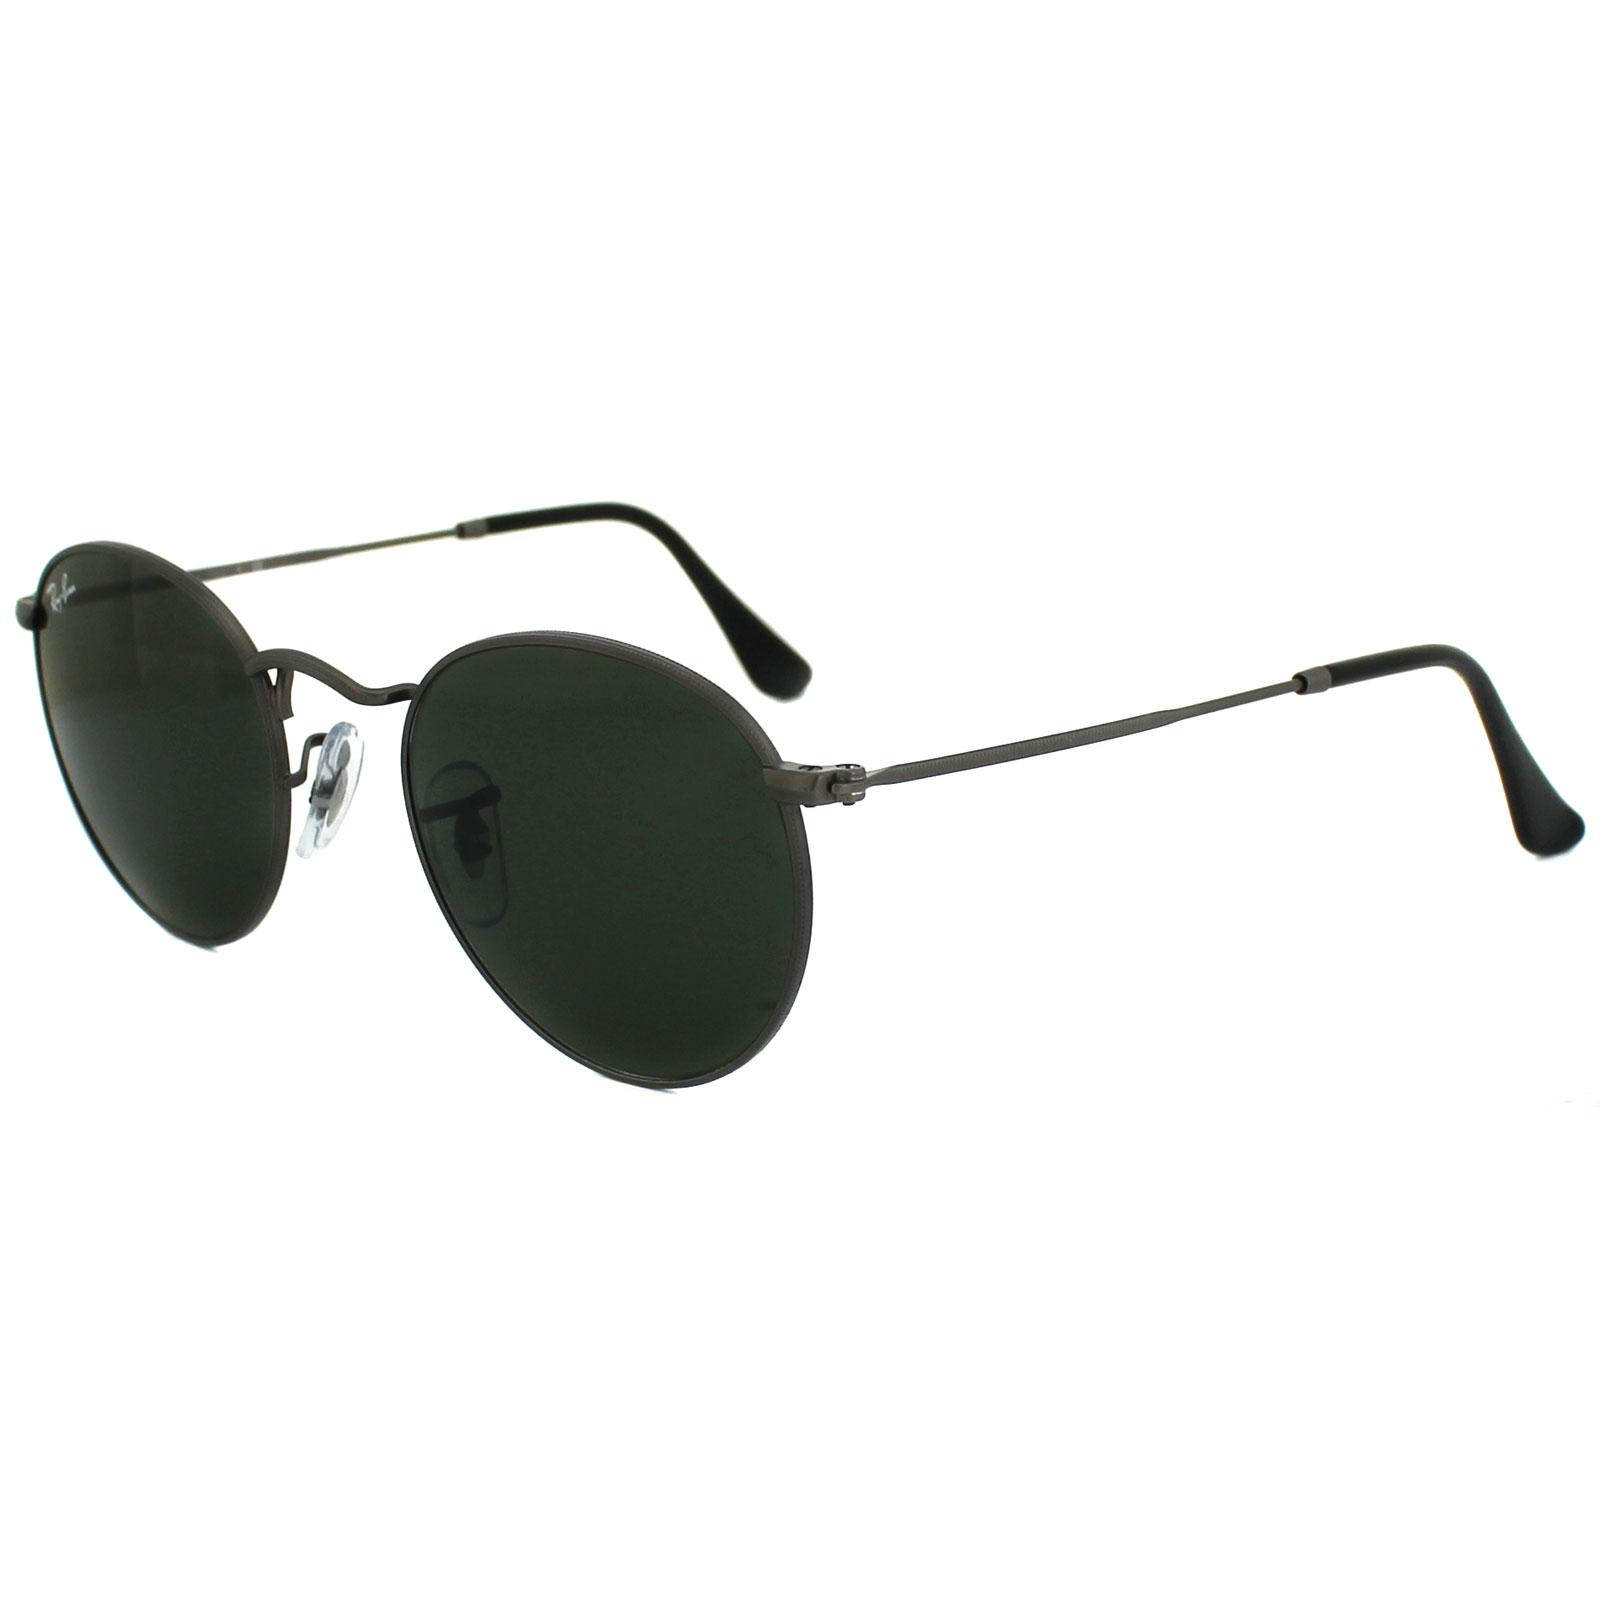 ray ban sonnenbrille round metal 3447 029 matt gunmetal. Black Bedroom Furniture Sets. Home Design Ideas